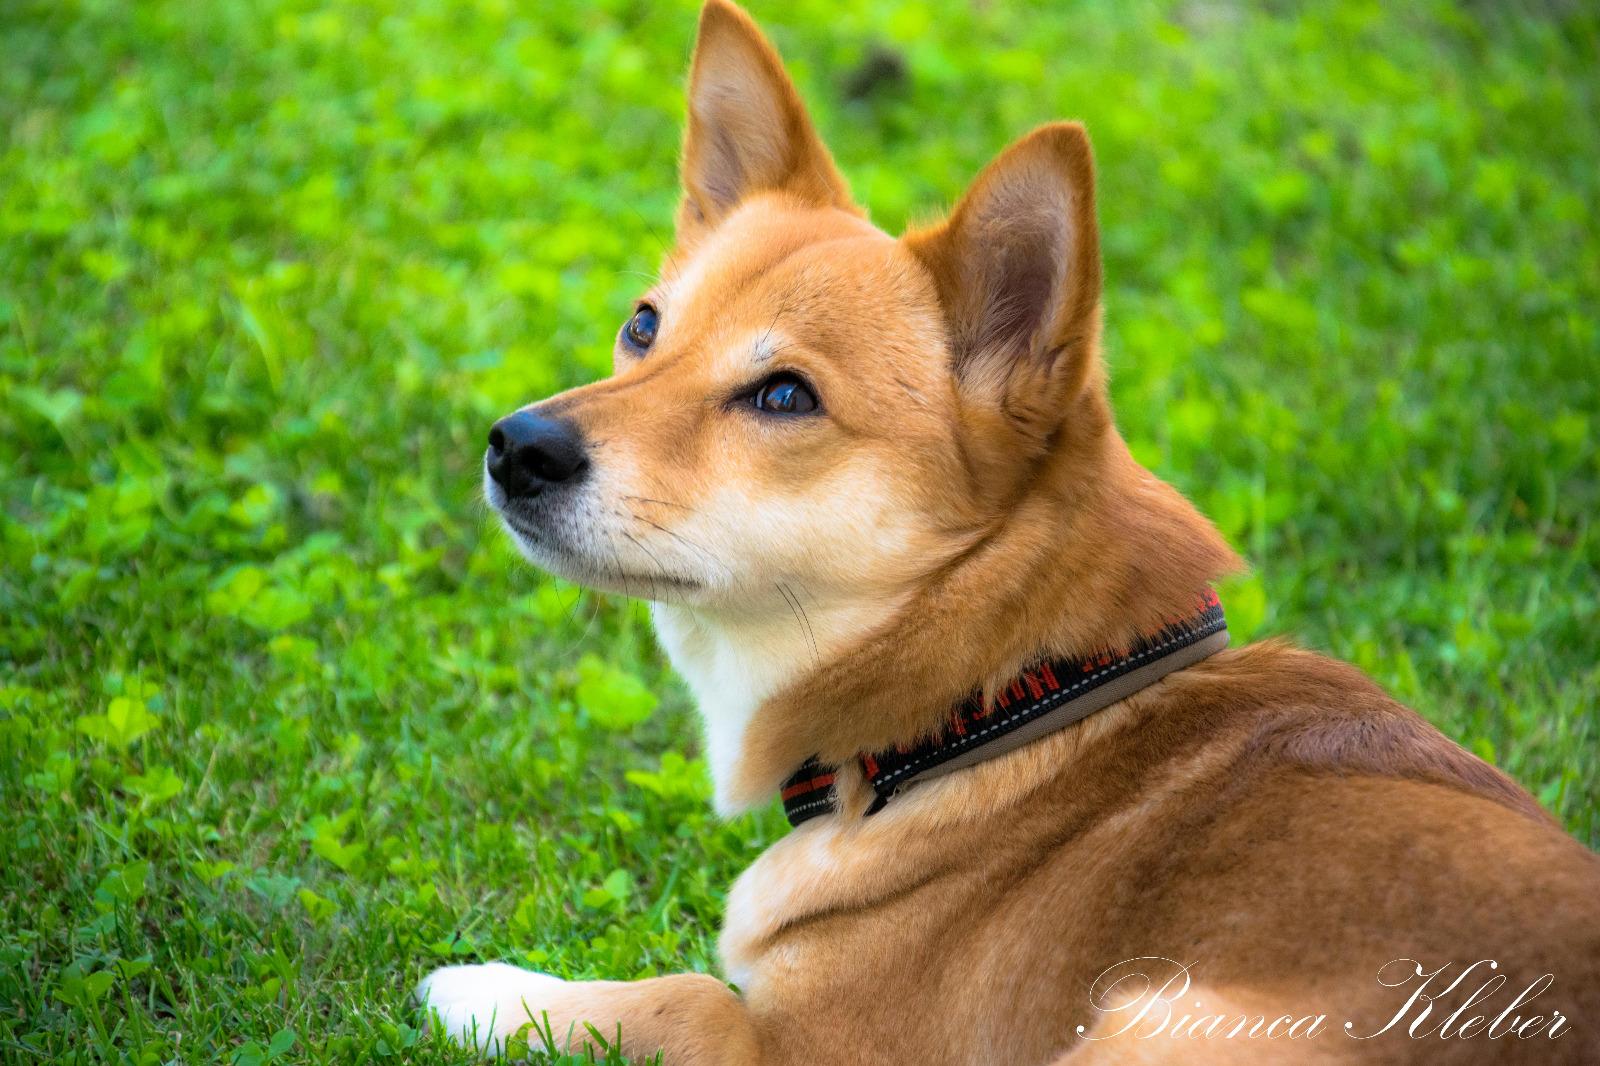 shiba inu foto bild hunde hund natur bilder auf fotocommunity. Black Bedroom Furniture Sets. Home Design Ideas